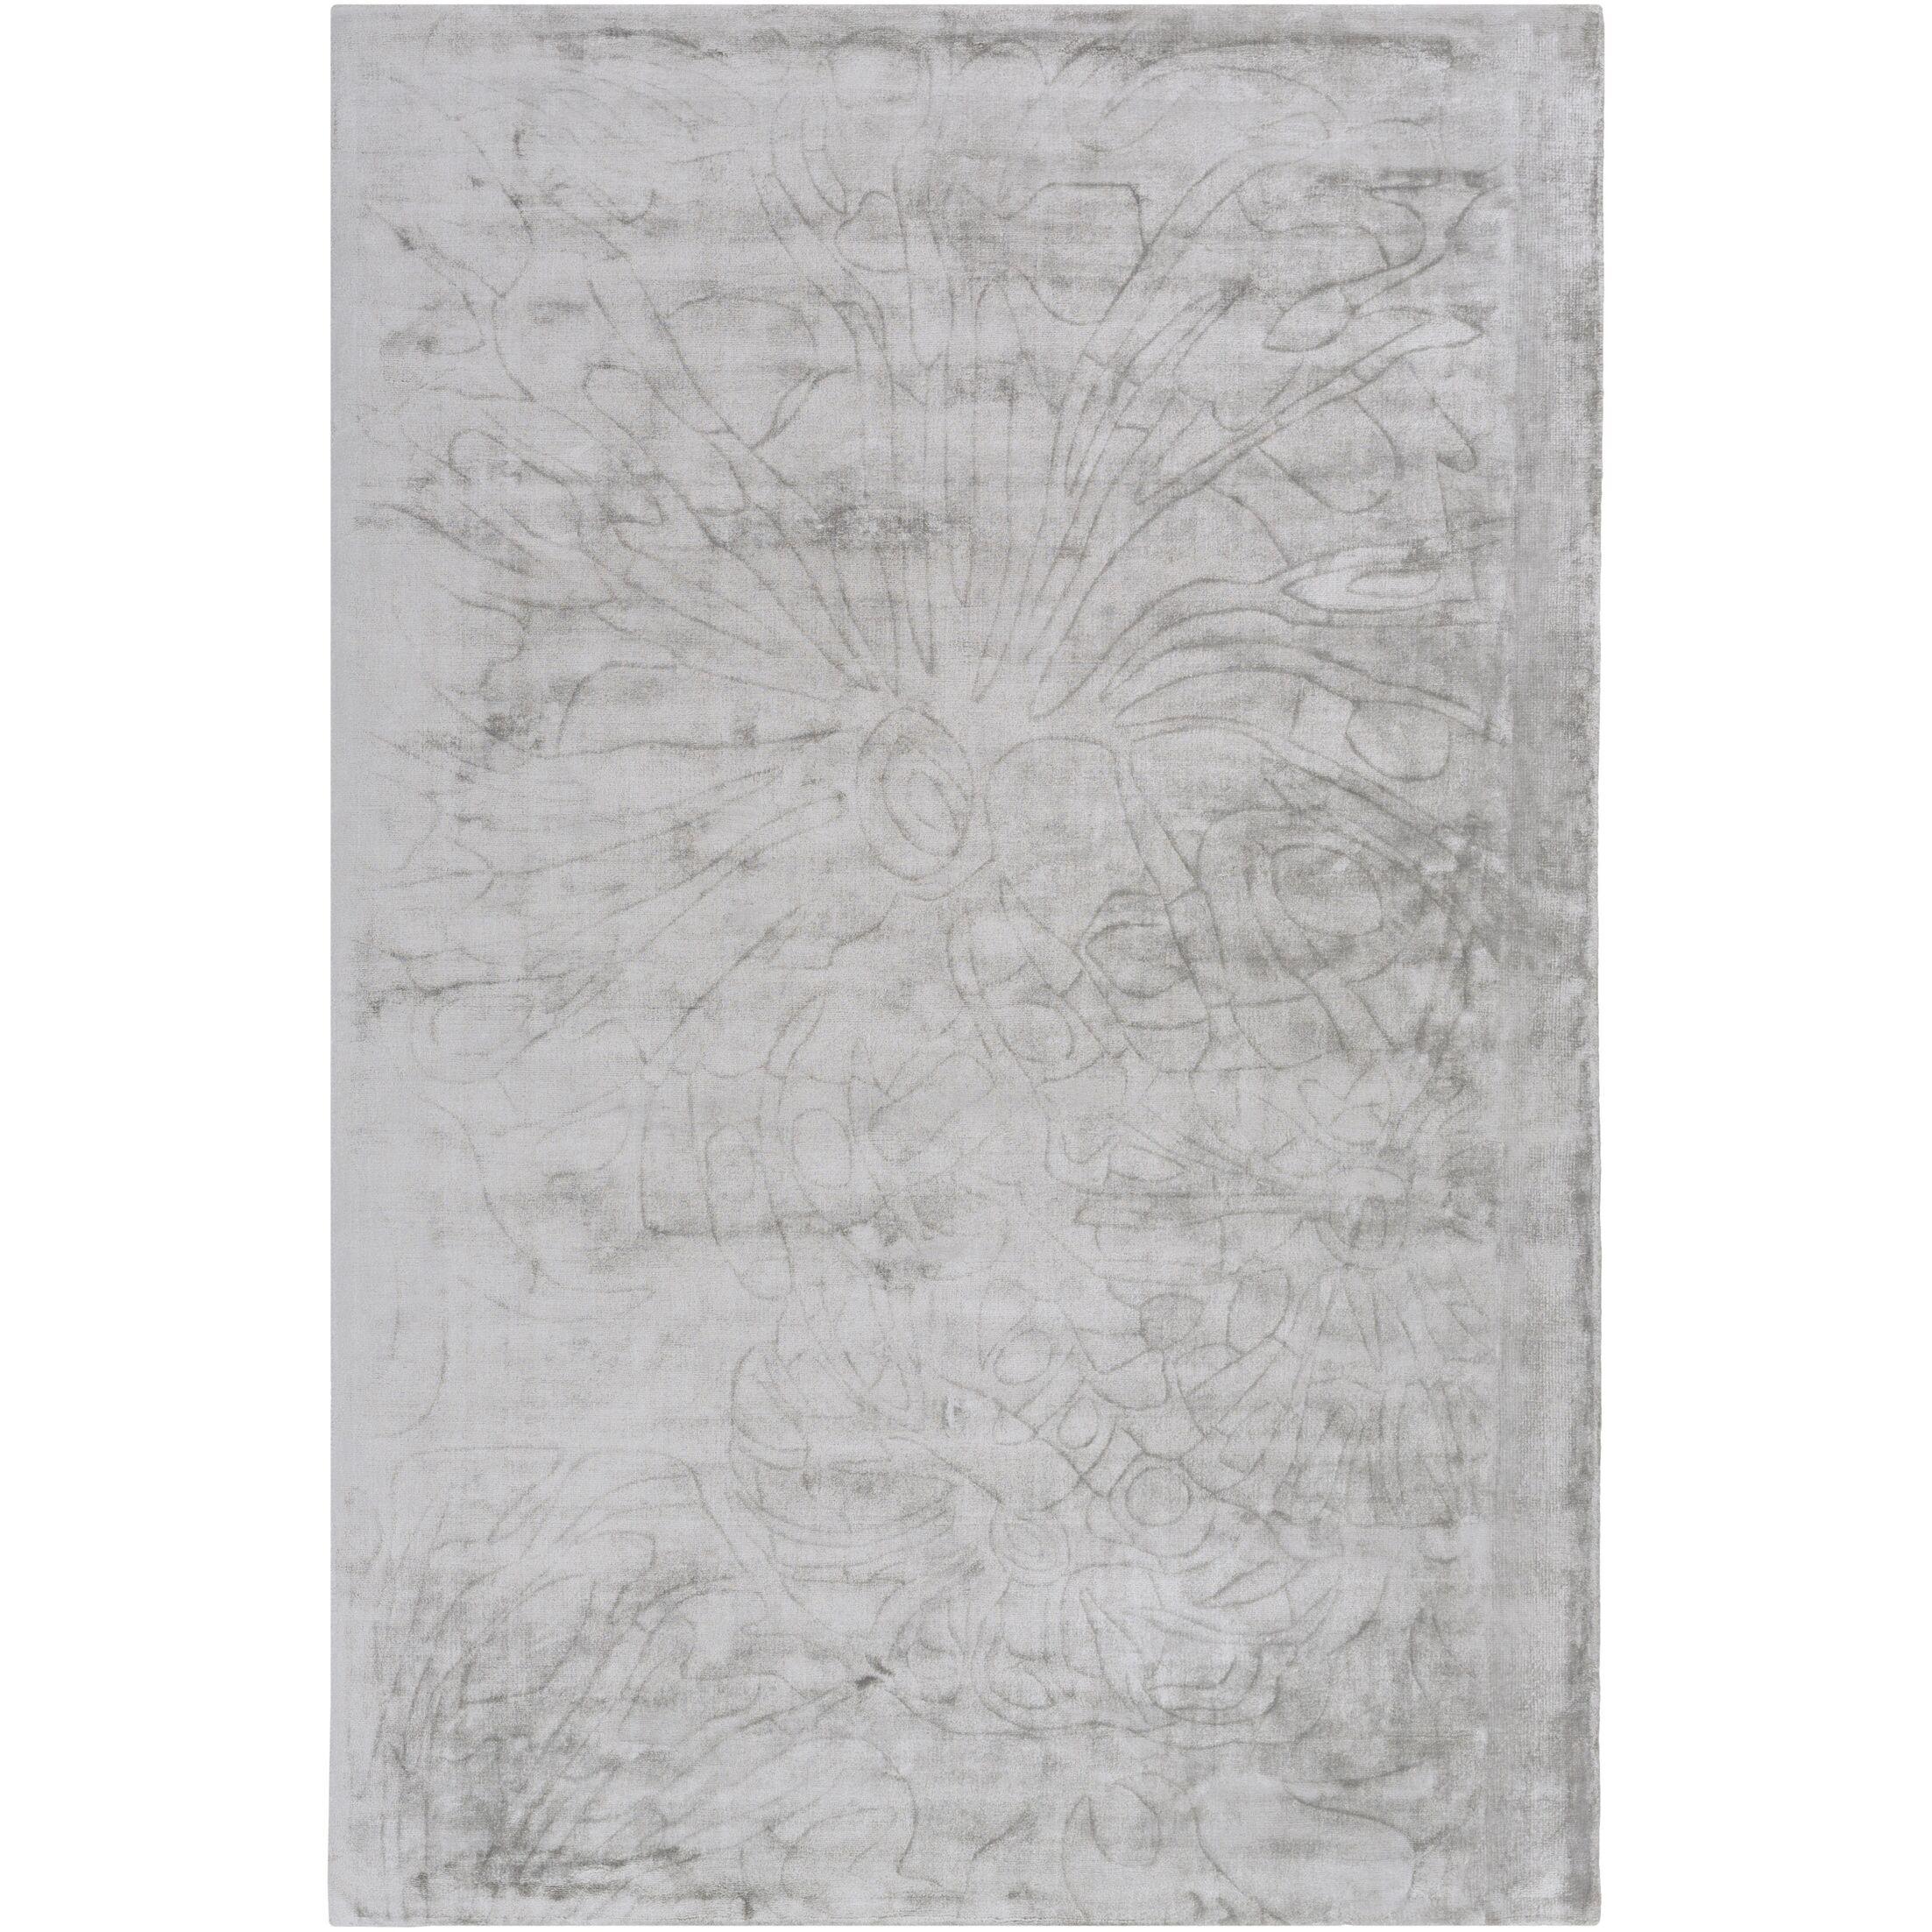 Ayala Hand-Loomed Medium Gray Area Rug Rug Size: Rectangle 2' x 3'